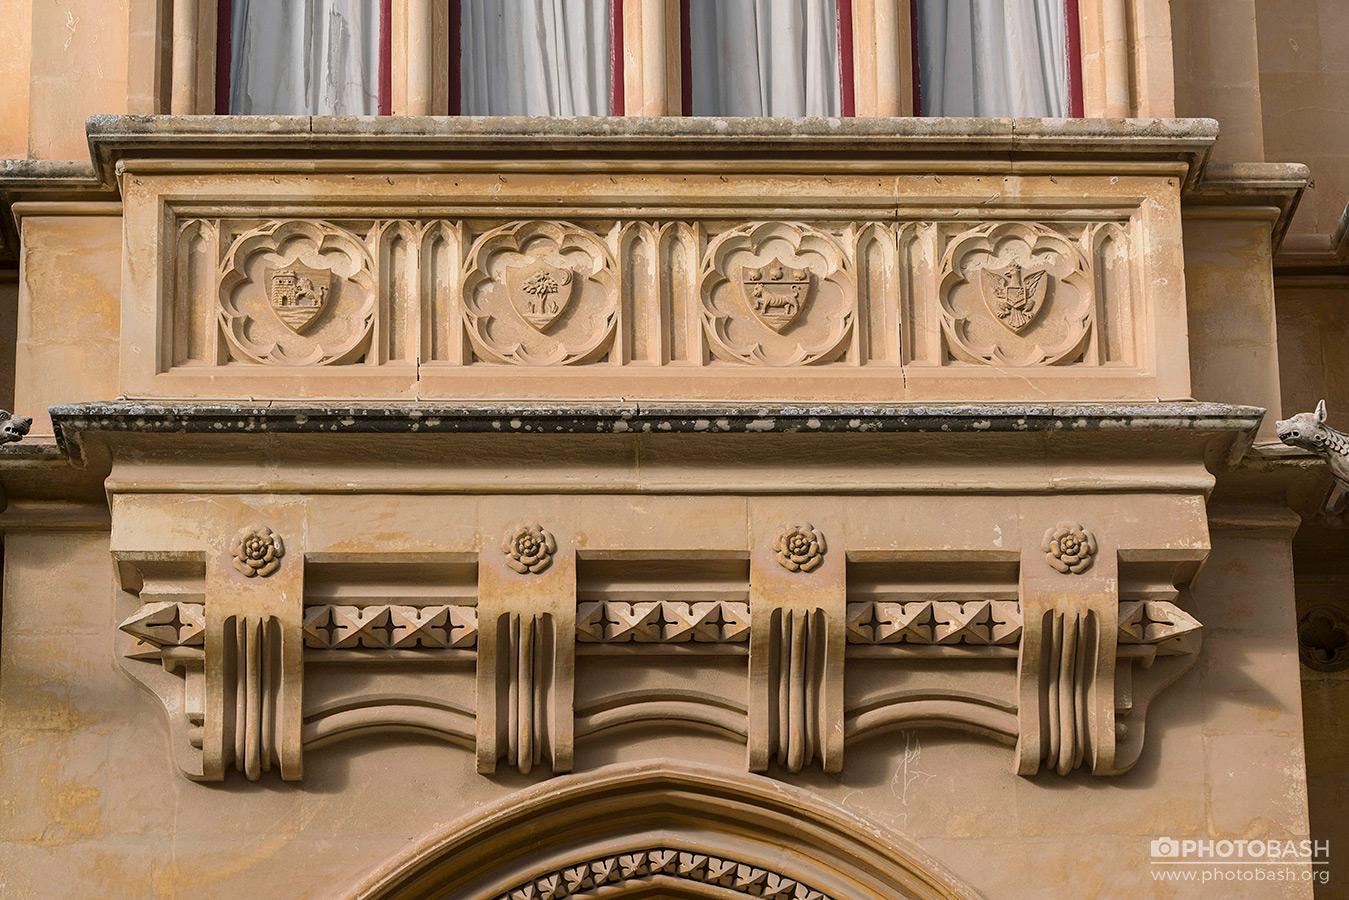 Sandstone-City-Balcony-Ornaments.jpg